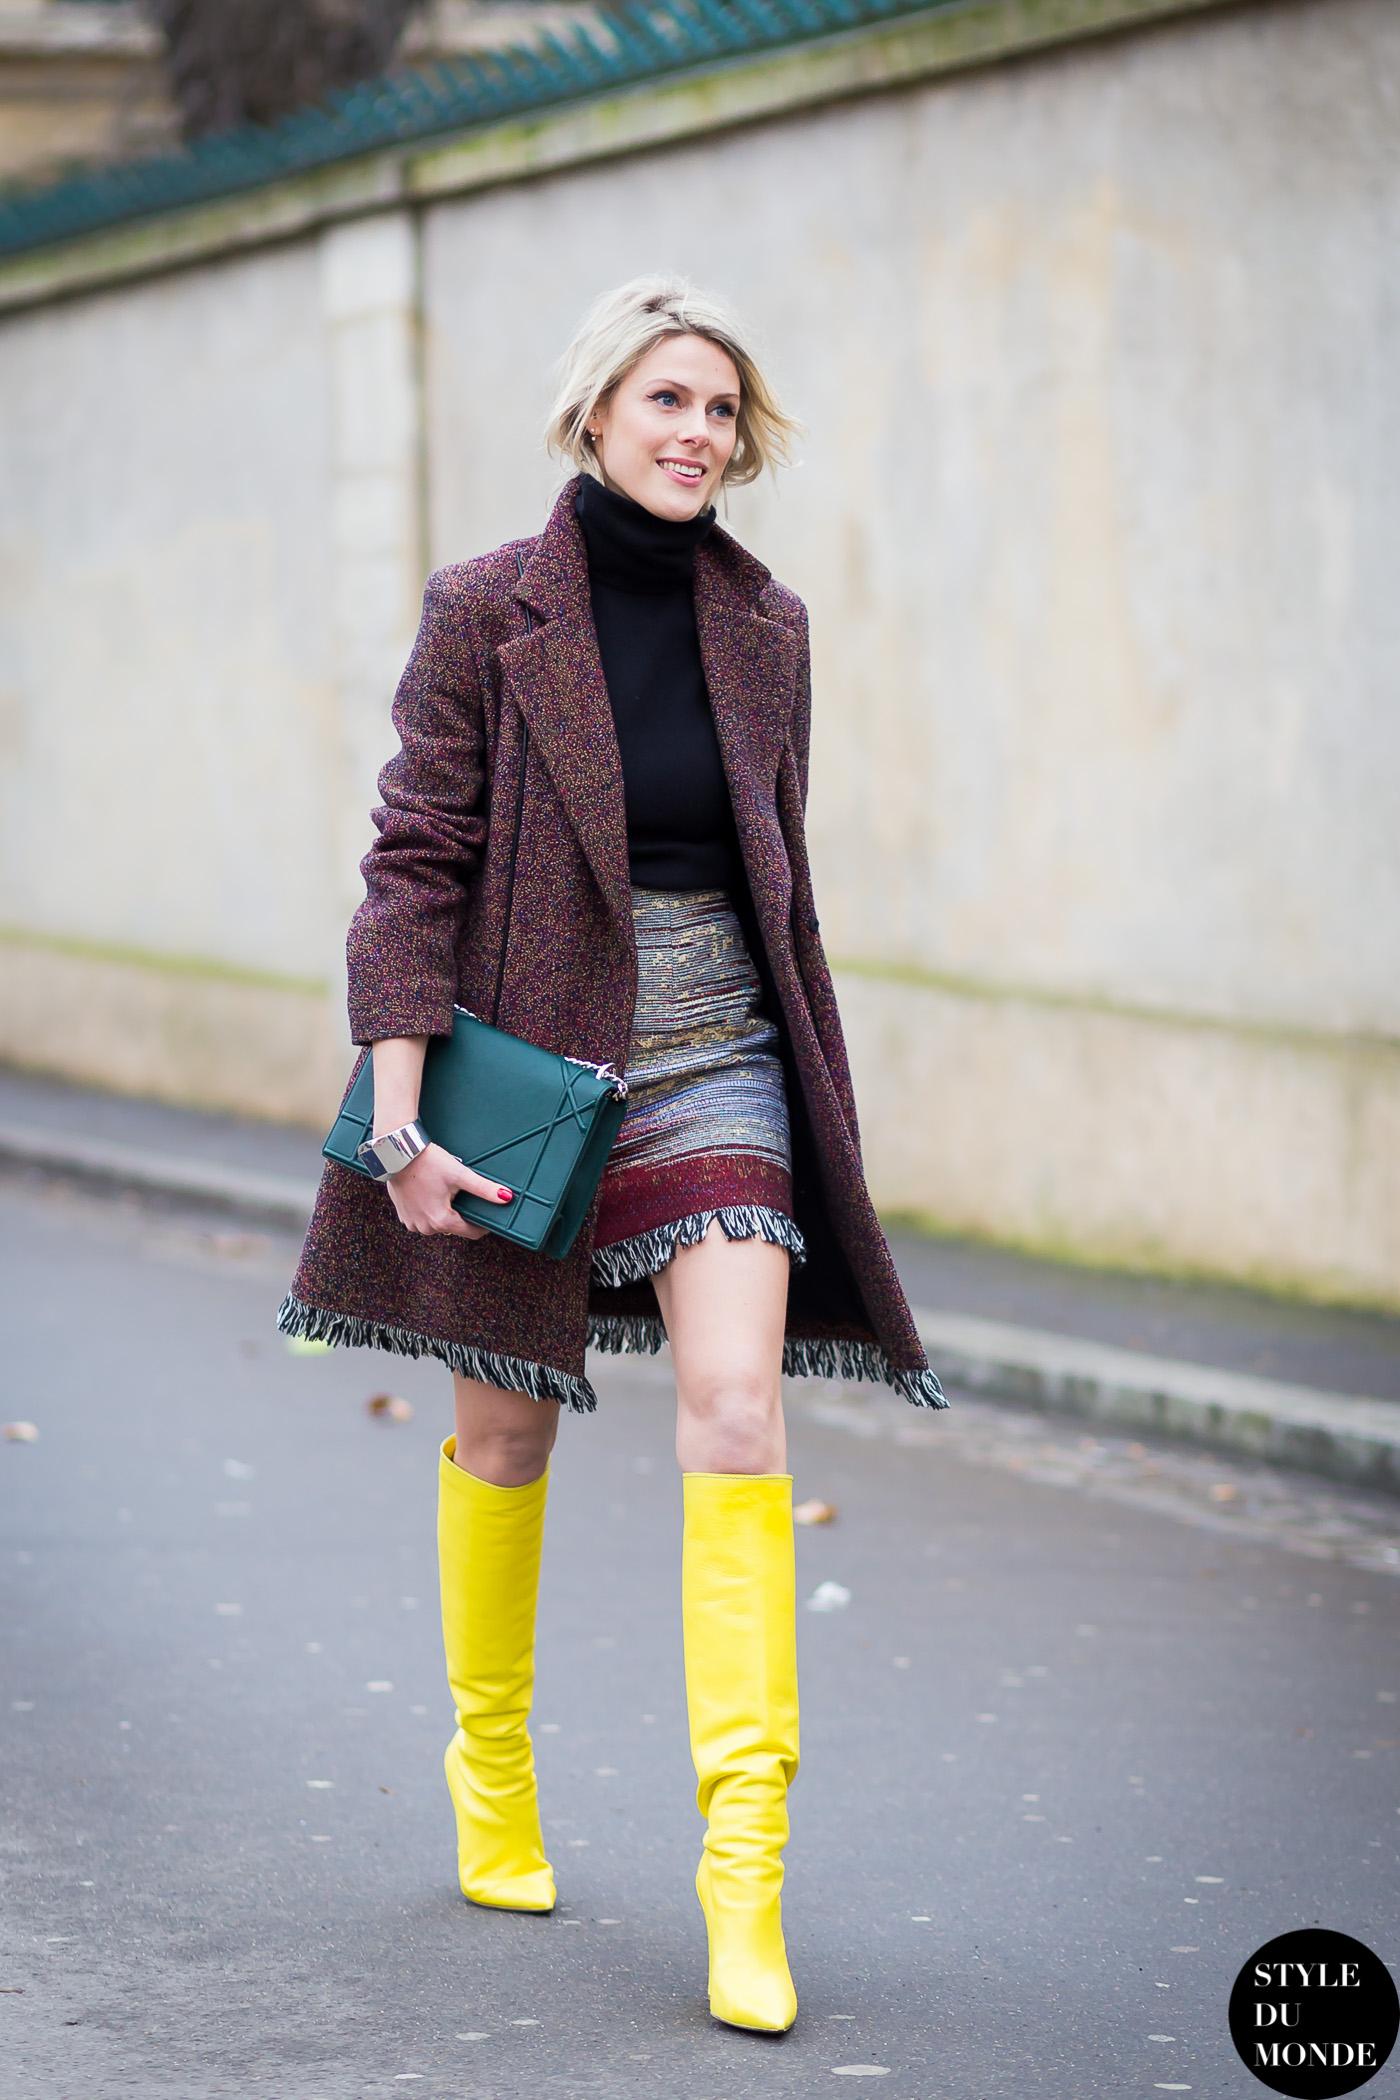 sofie valkiers by styledumonde street style fashion blogmg1649 16070788810961410656611